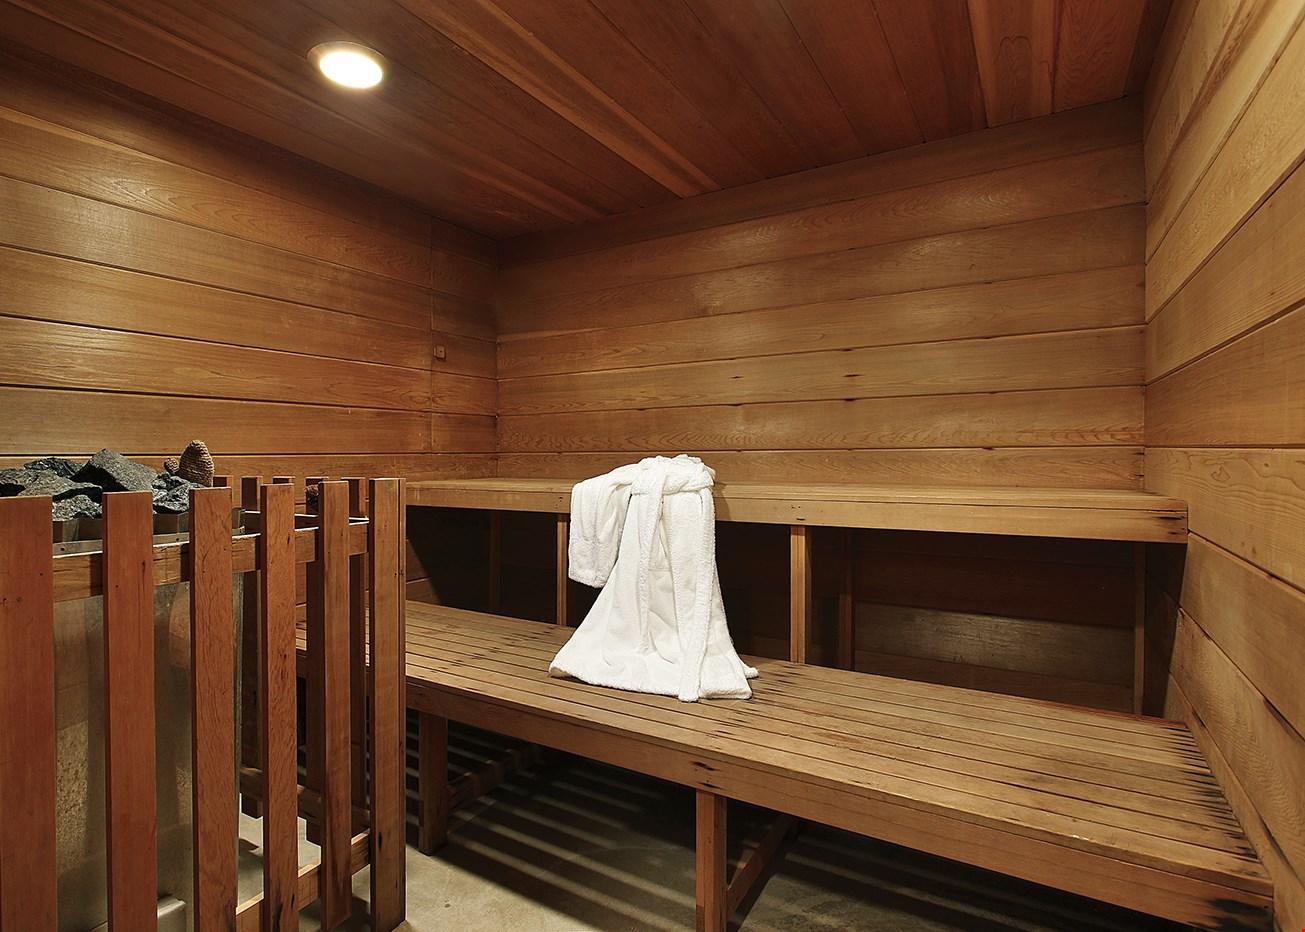 Berry Chiropractic Center - $30 Toward 3 Far Infrared Sauna Sessions (Reg. 60)